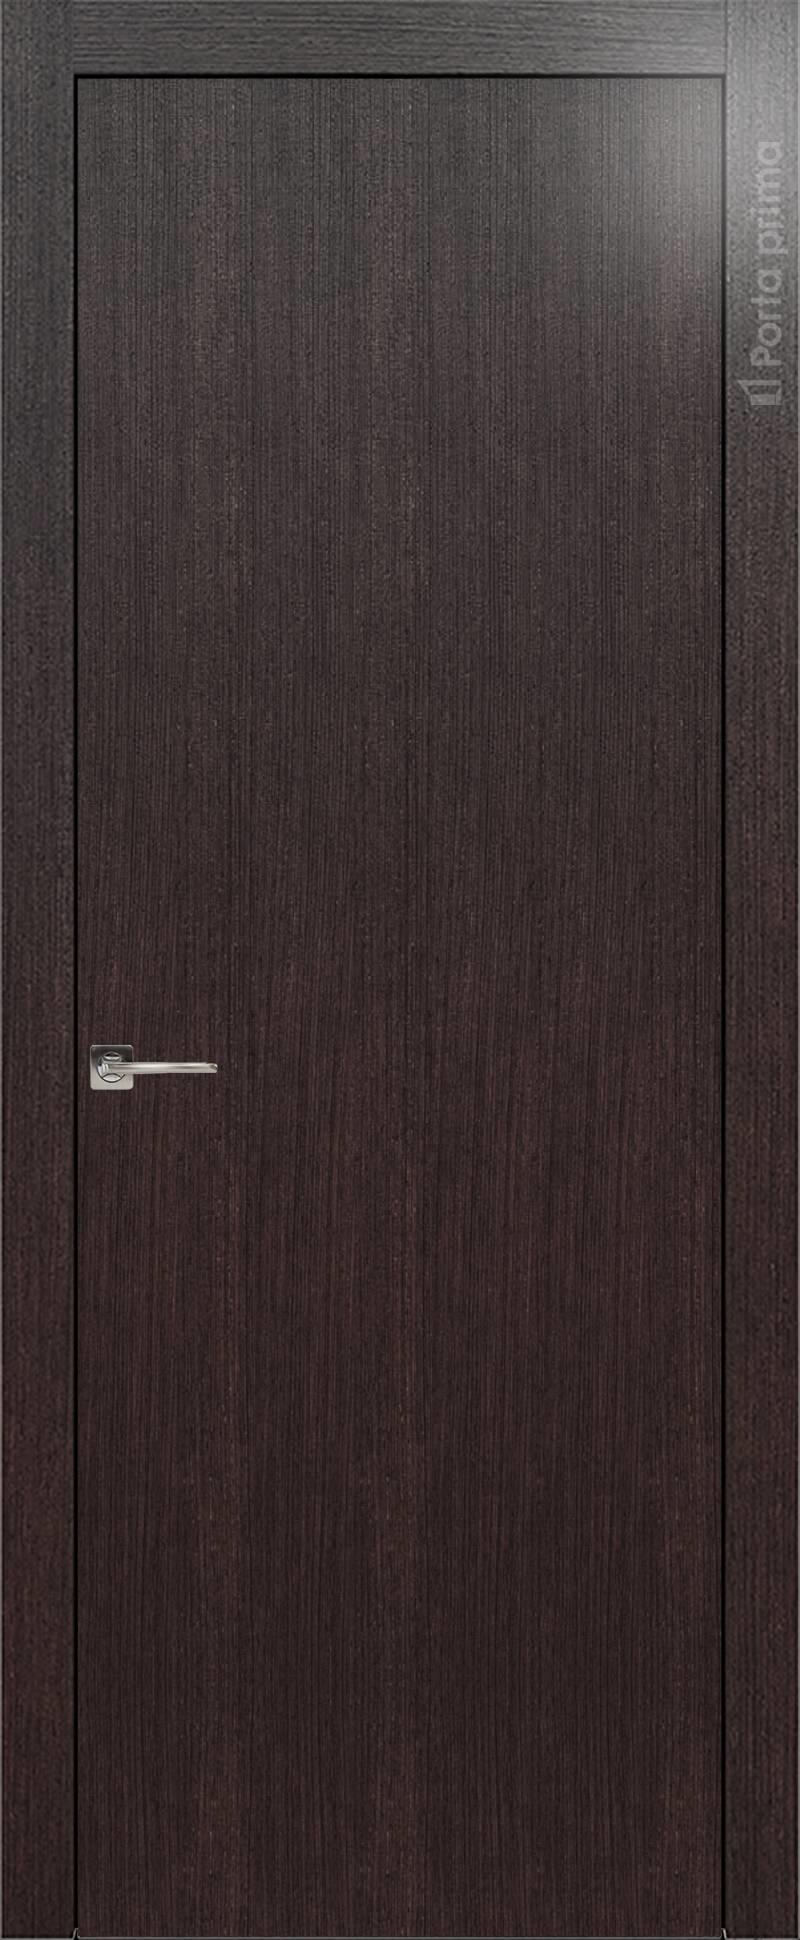 Tivoli А-1 цвет - Венге Шоколад Без стекла (ДГ)